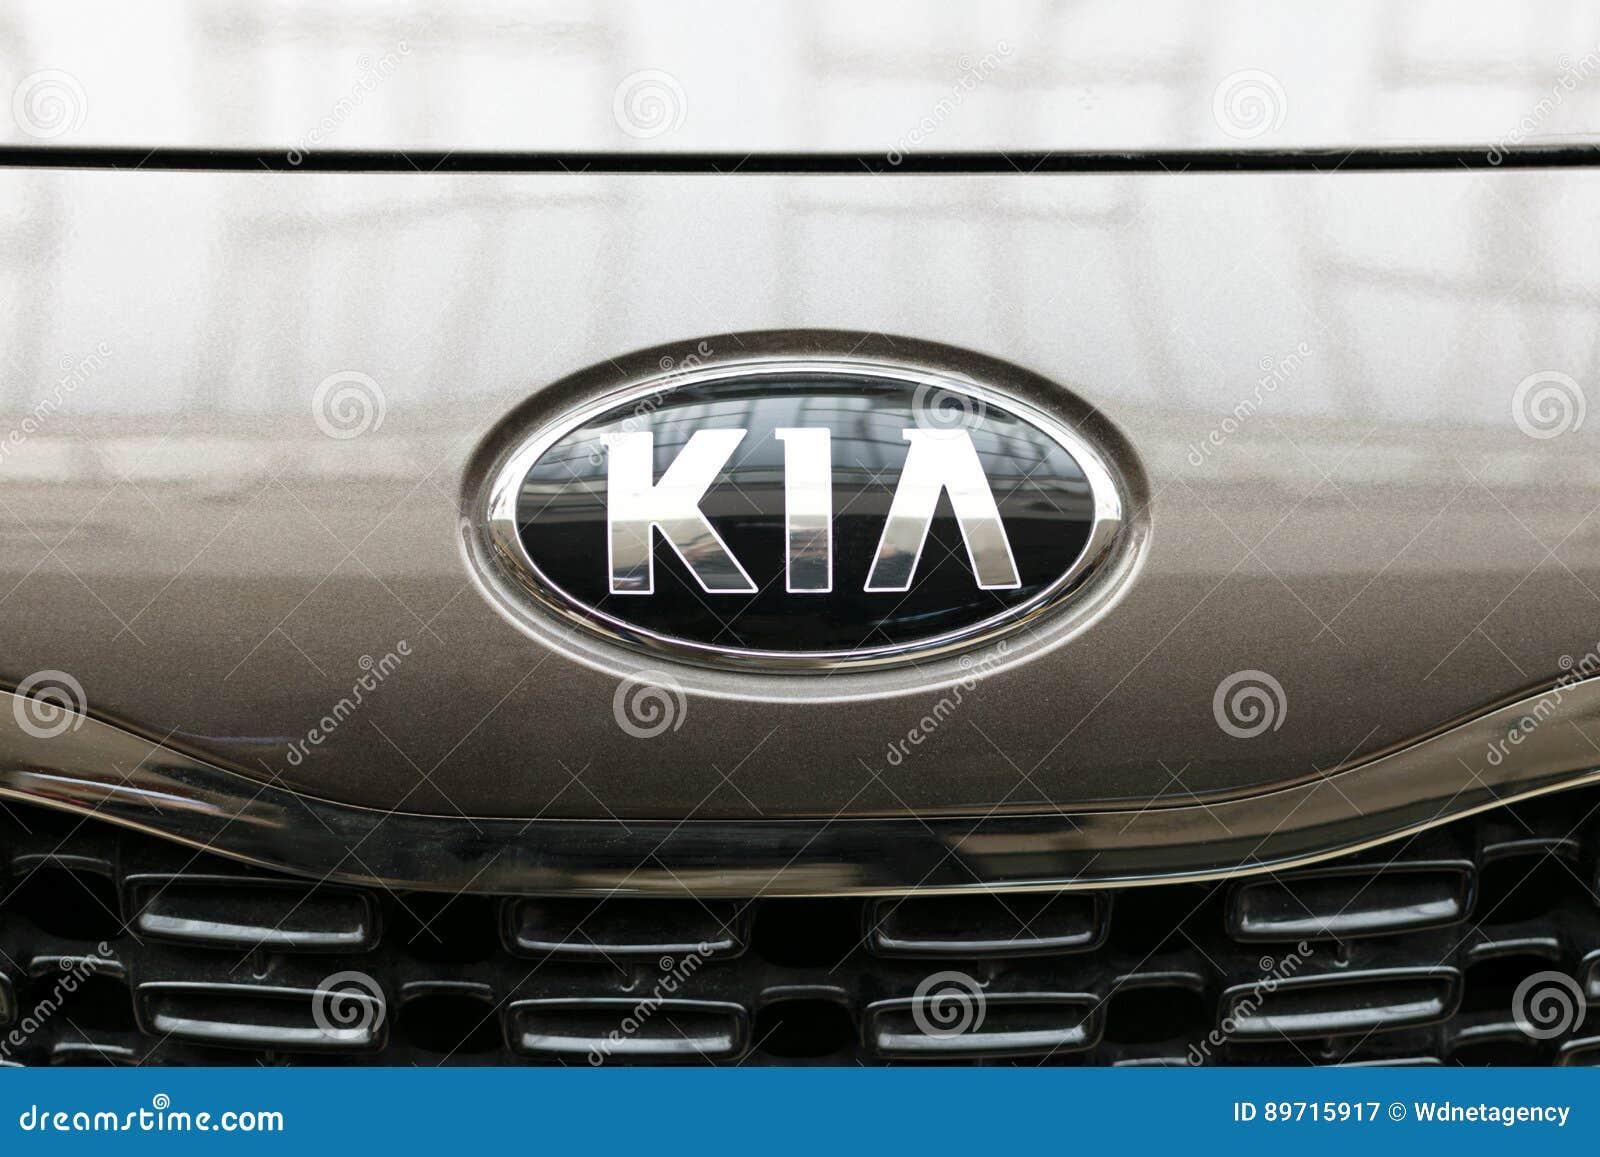 Kia motors sign editorial photography image 89715917 for Kia gunther motor co